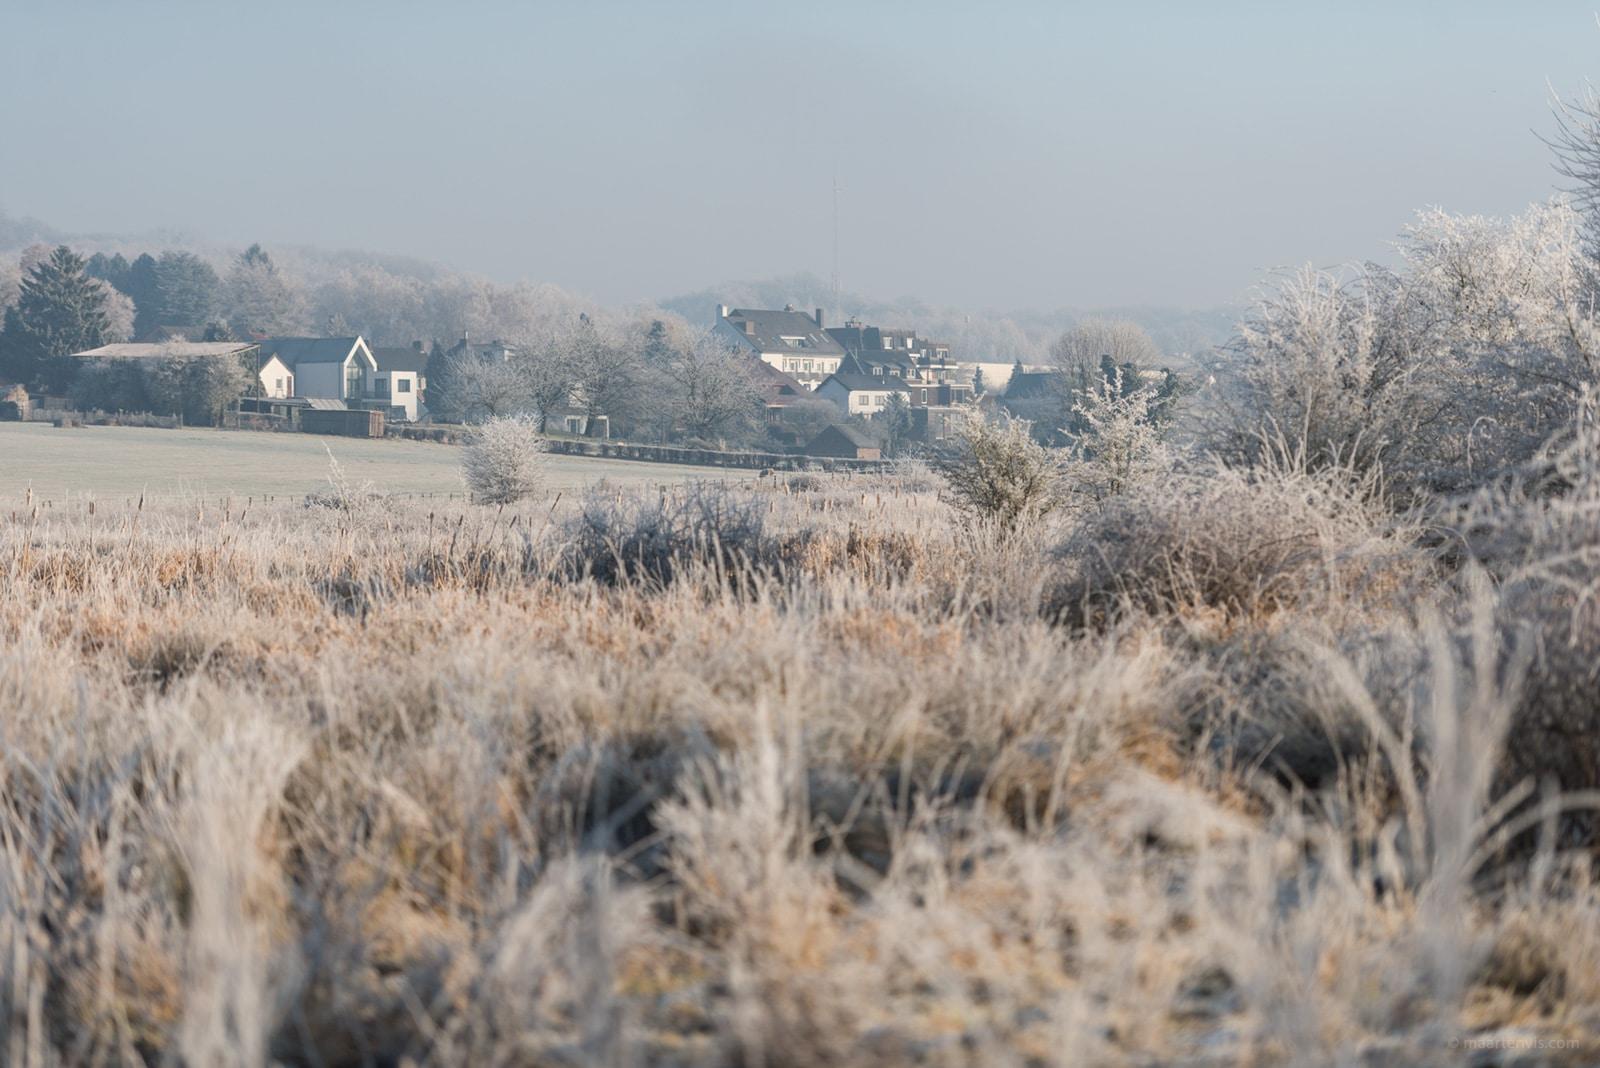 Winter in Limburg The Netherlands   Winter in Limburg The Netherlands   Winter in Limburg The Netherlands   Winter in Limburg The Netherlands